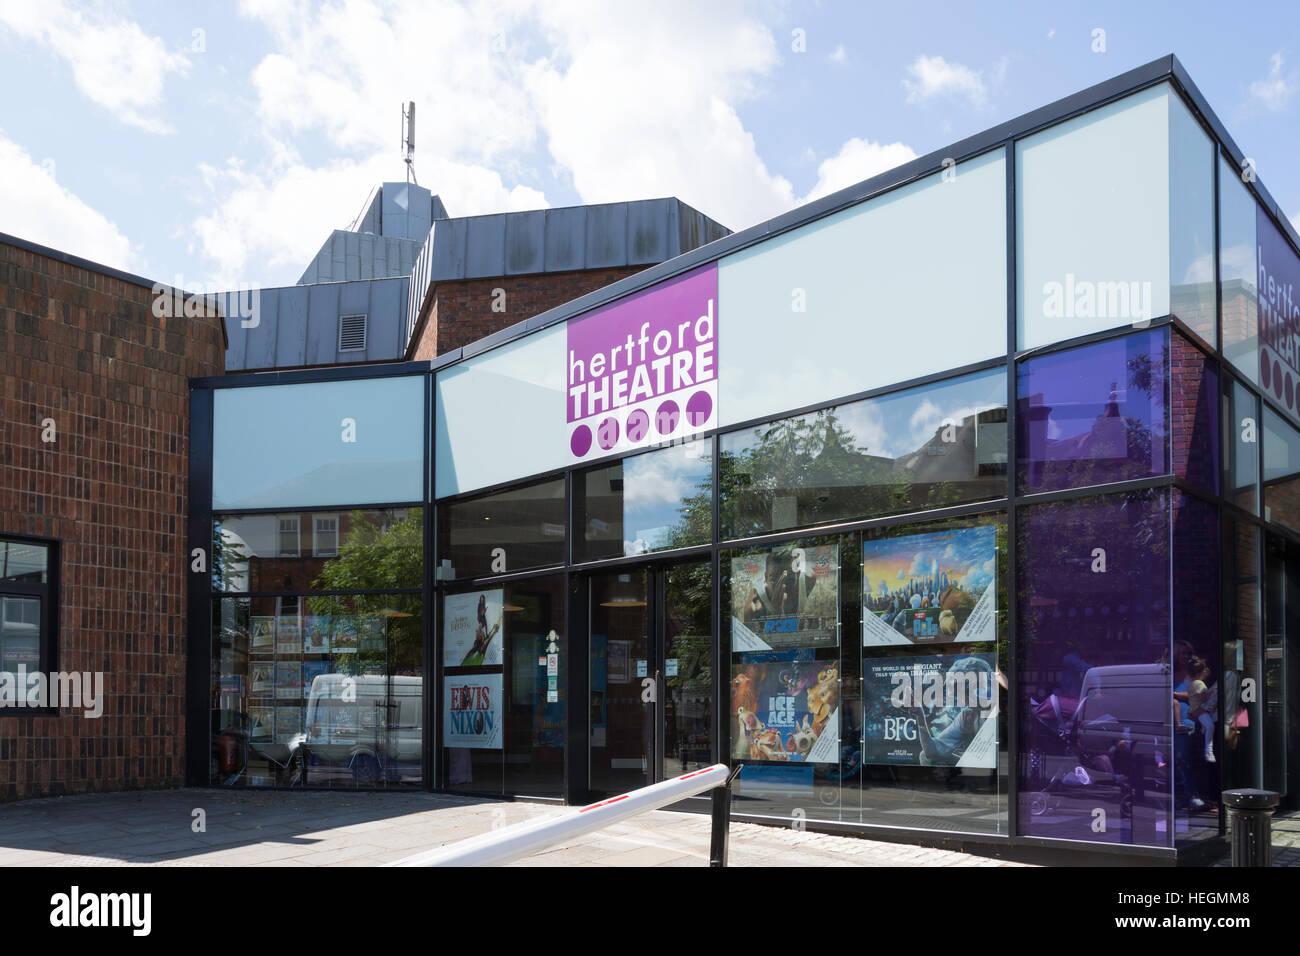 Hertford Theatre, The Wash, Hertford, Hertfordshire, England, United Kingdom - Stock Image